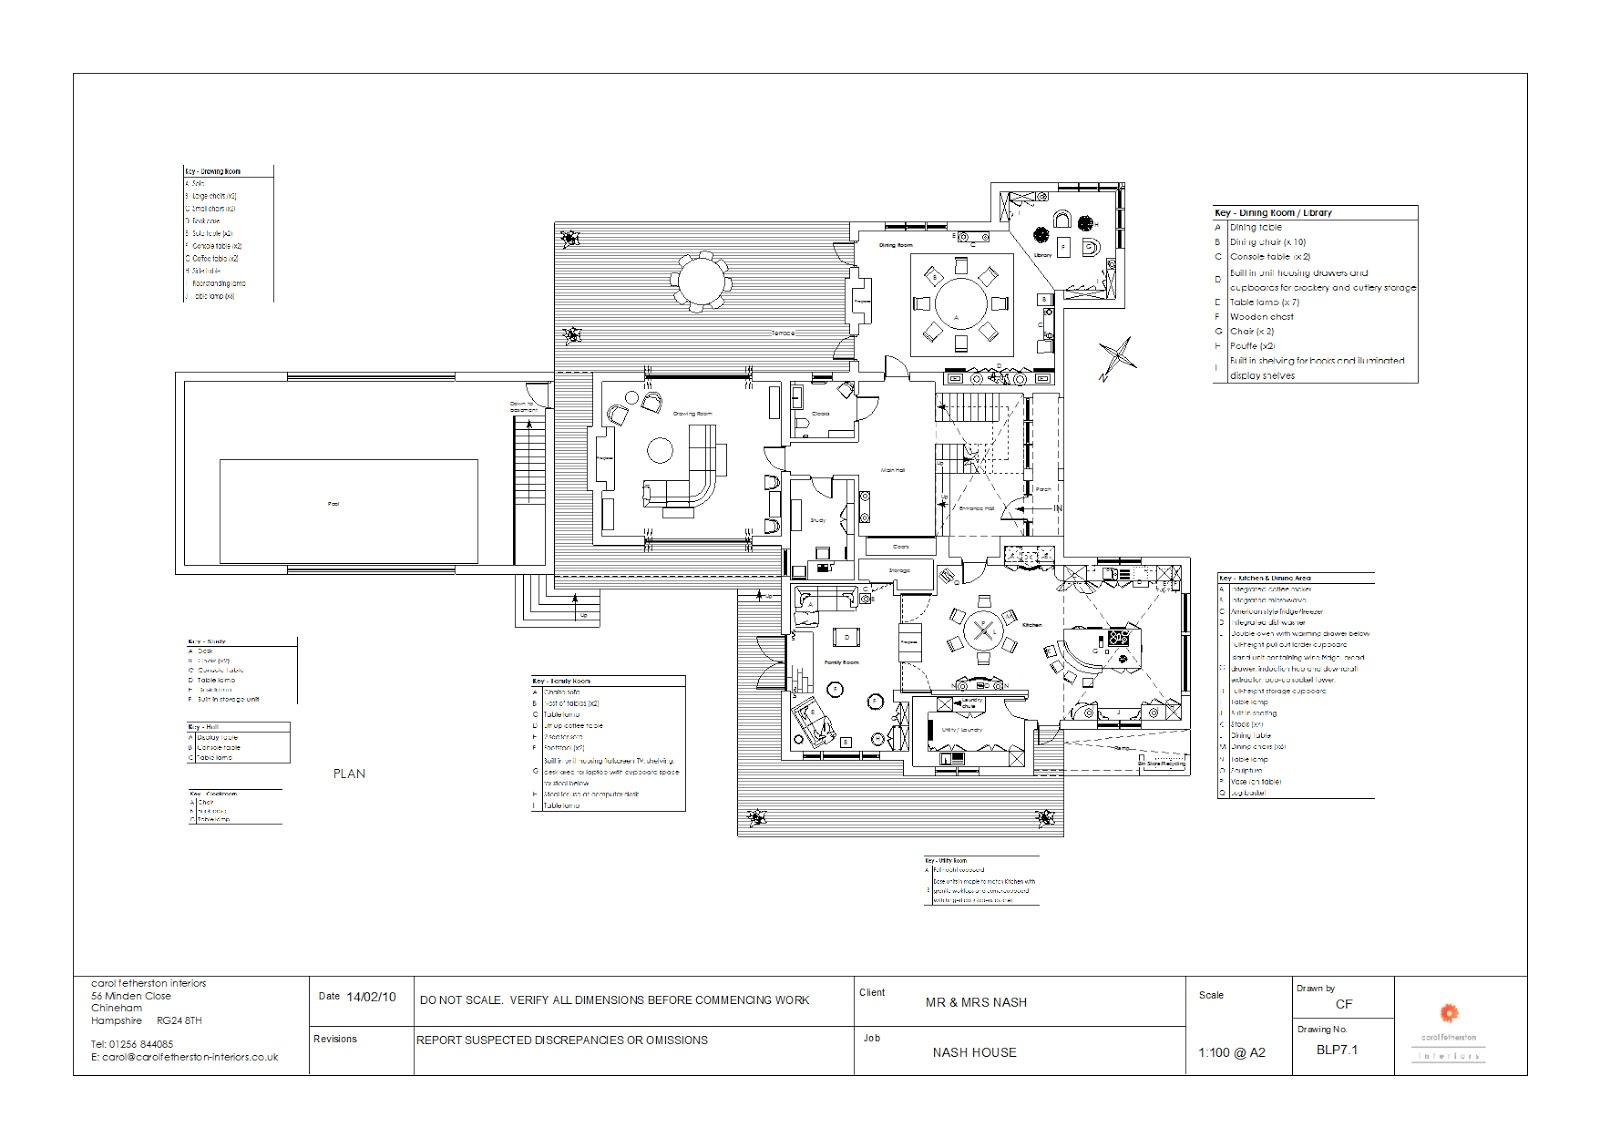 Interior Design Inspiration Ramblings From My Sofa  : 3GroundFloorPlanning from carolfetherston.blogspot.co.uk size 1600 x 1148 jpeg 213kB